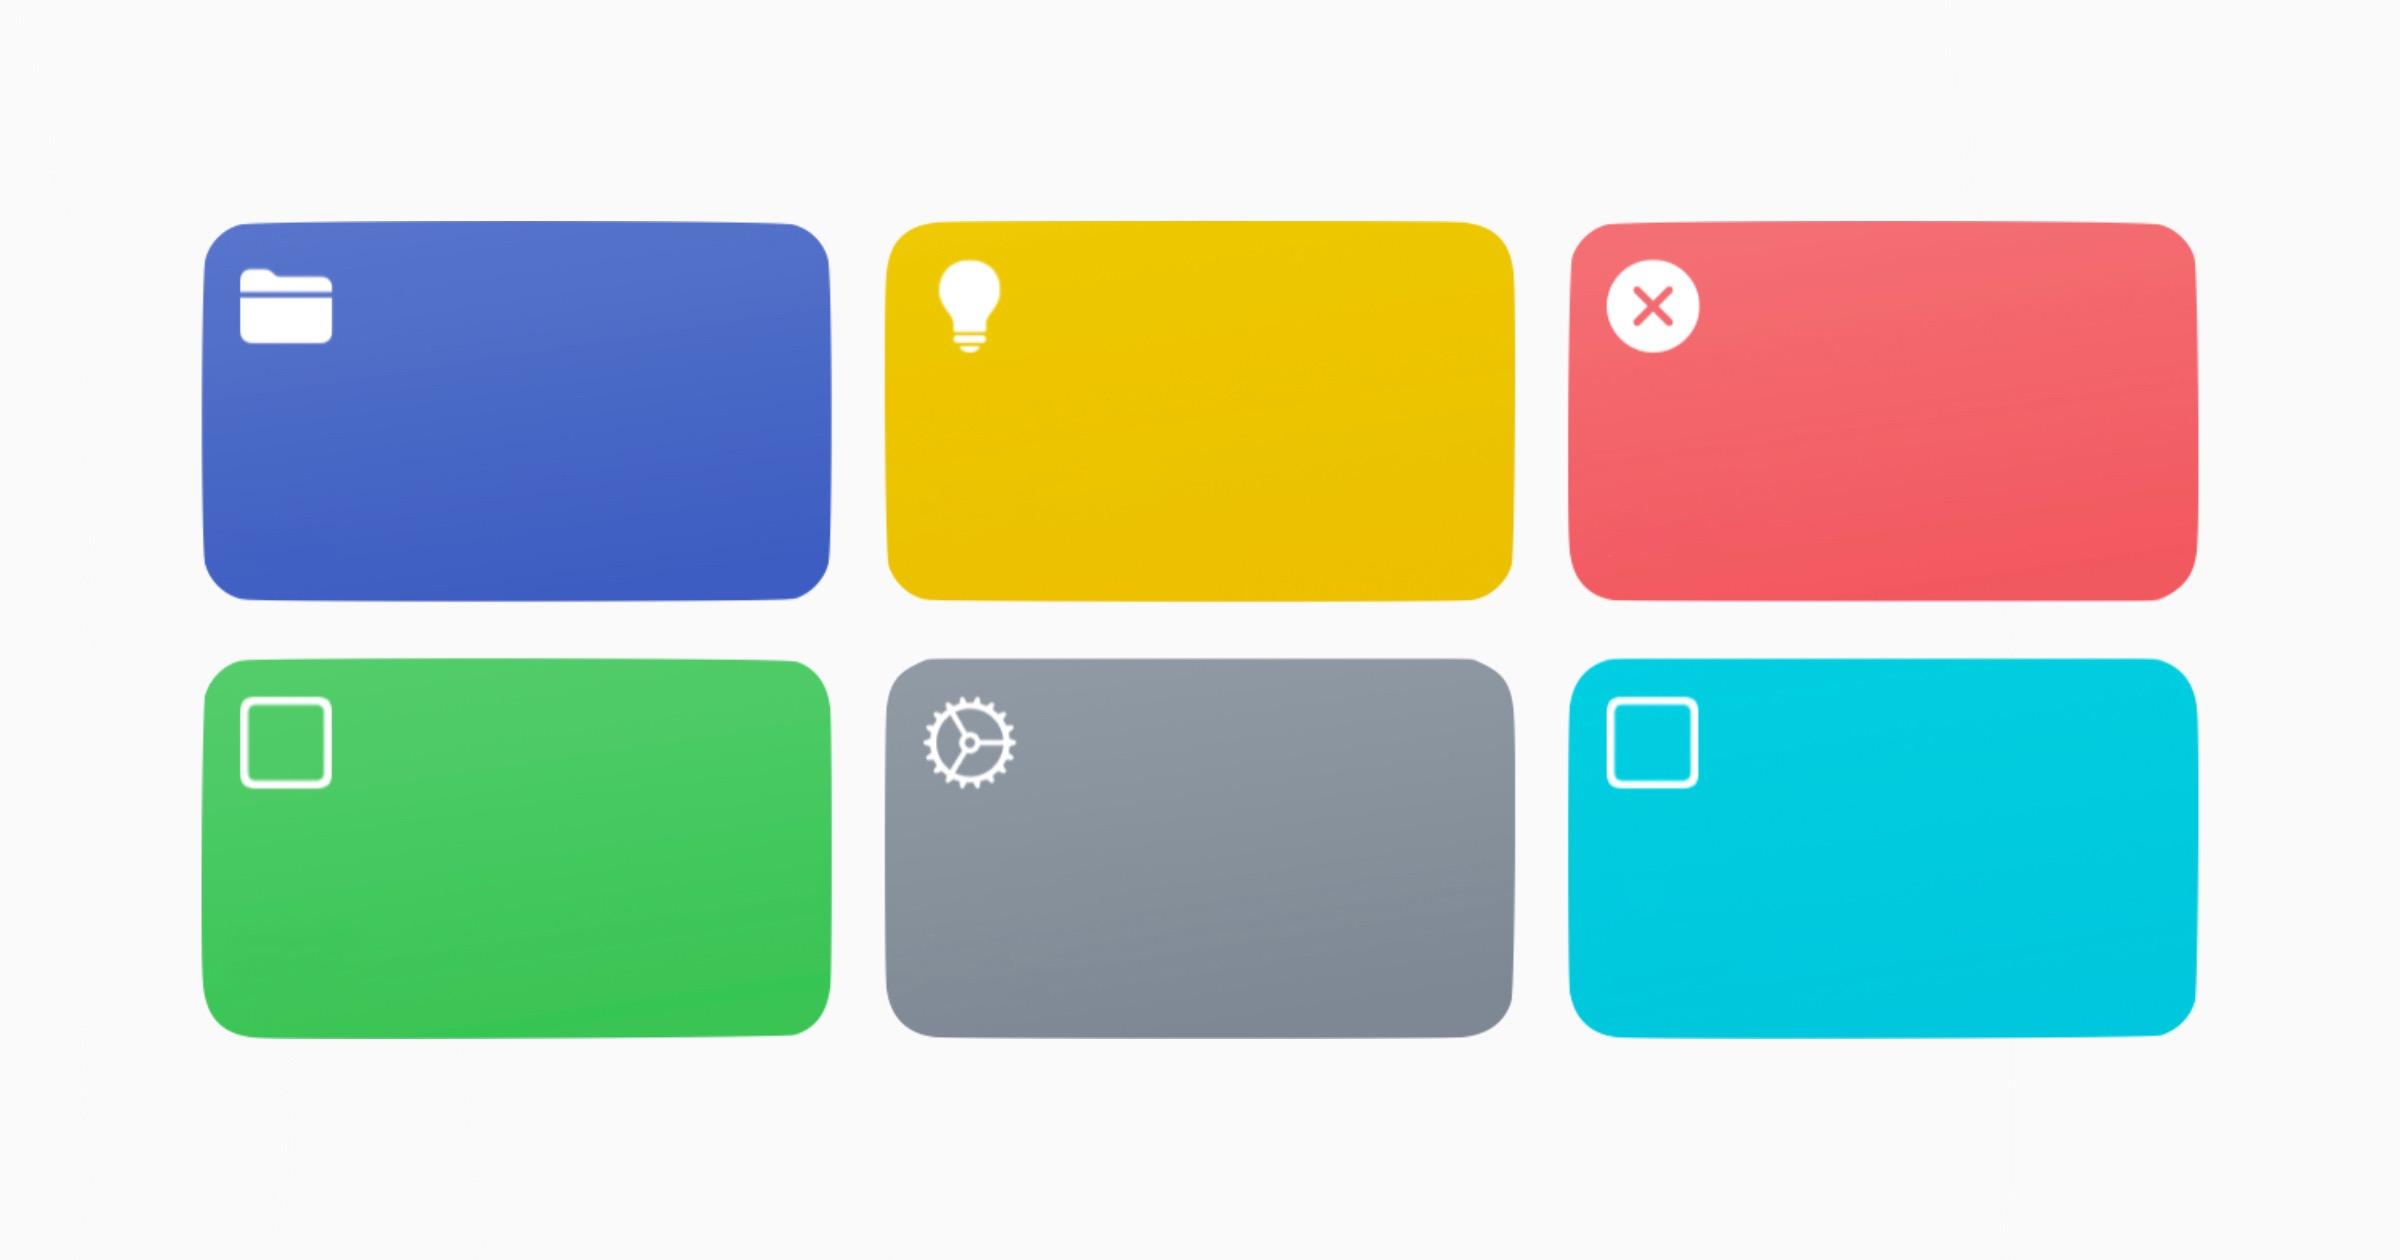 Generic shortcut icons